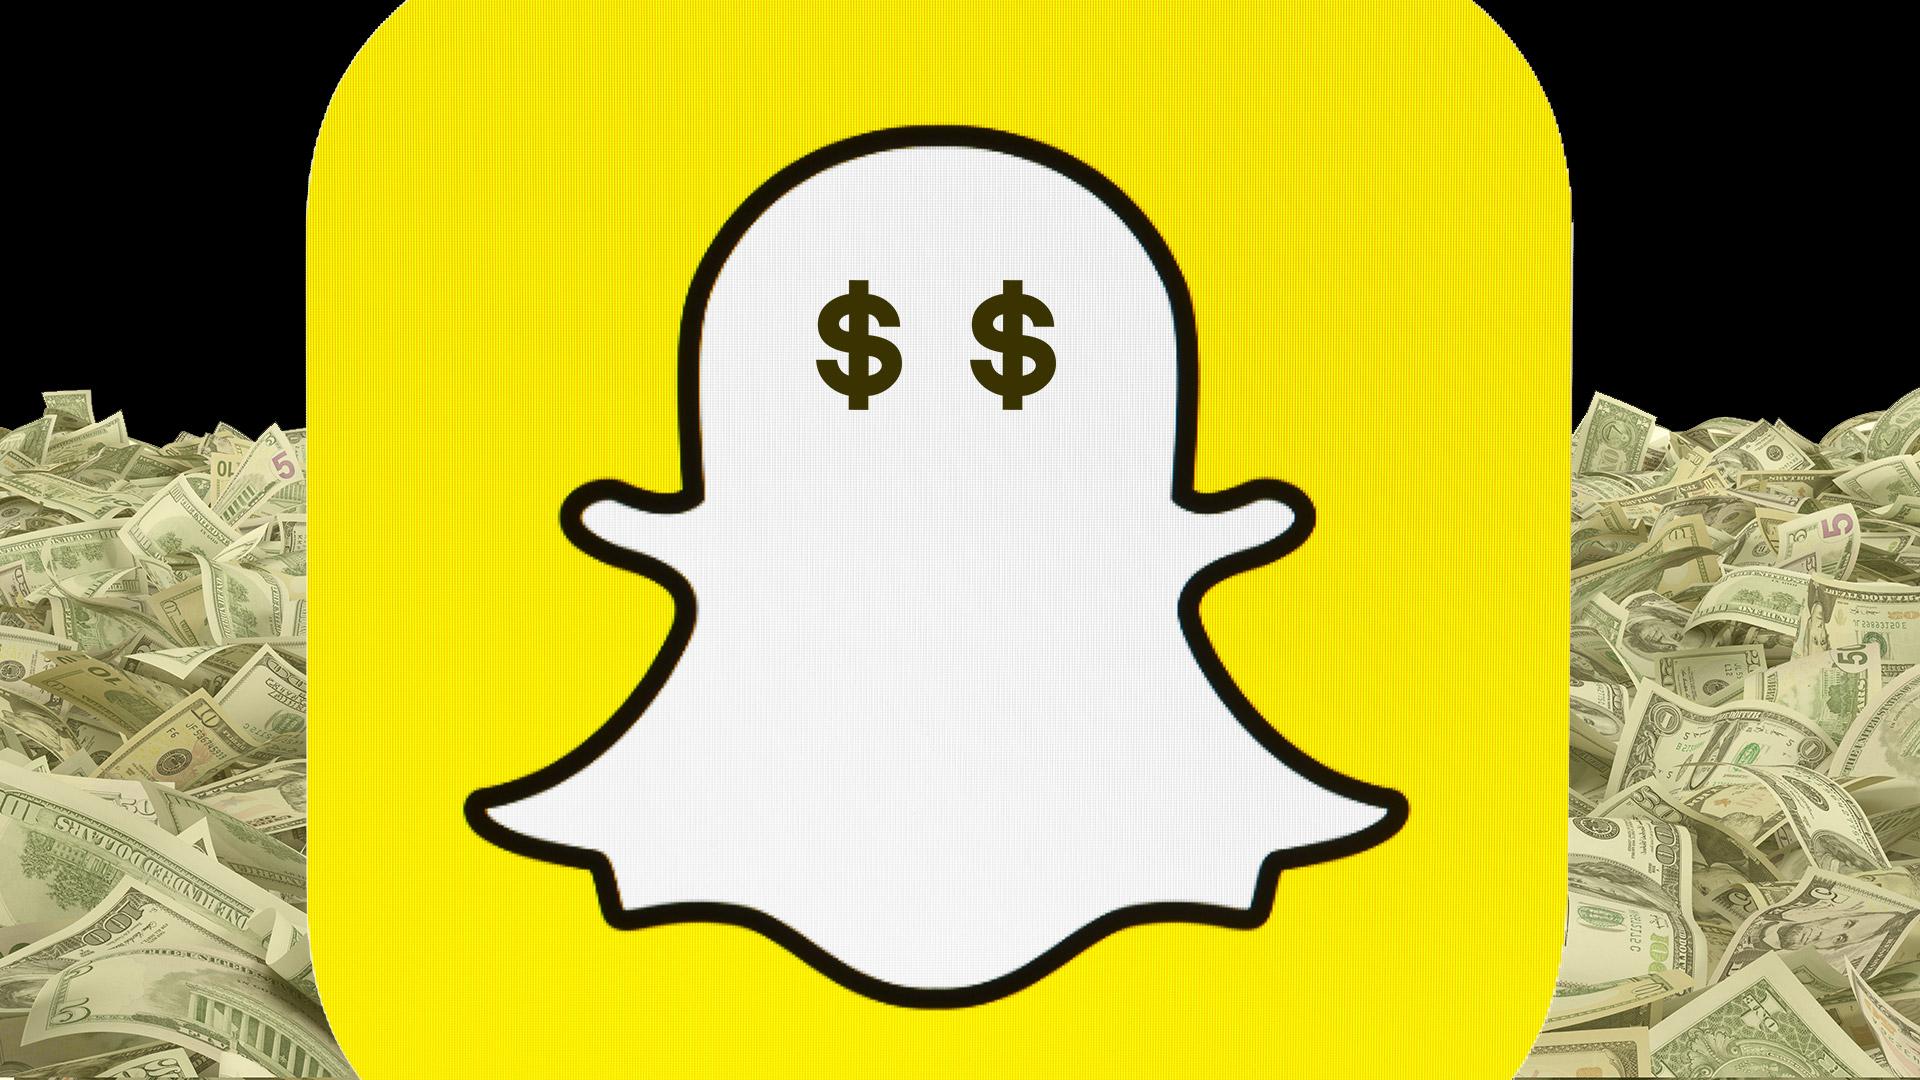 snapchat-money-dollars1-ss-1920